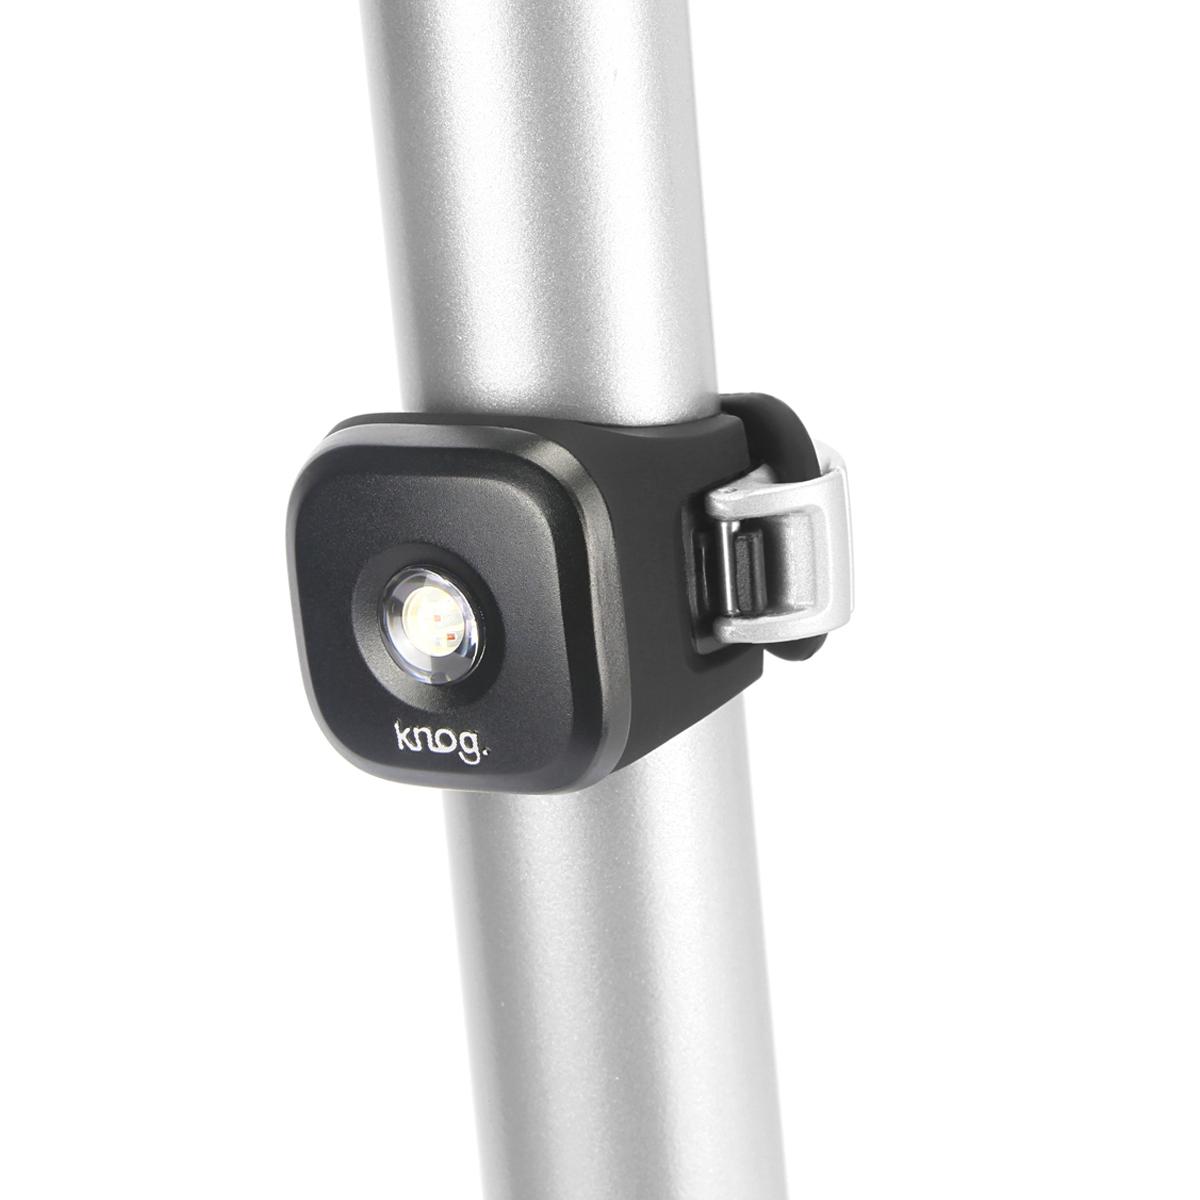 Éclairage arrière Knog Blinder Standard 1 LED - Argent